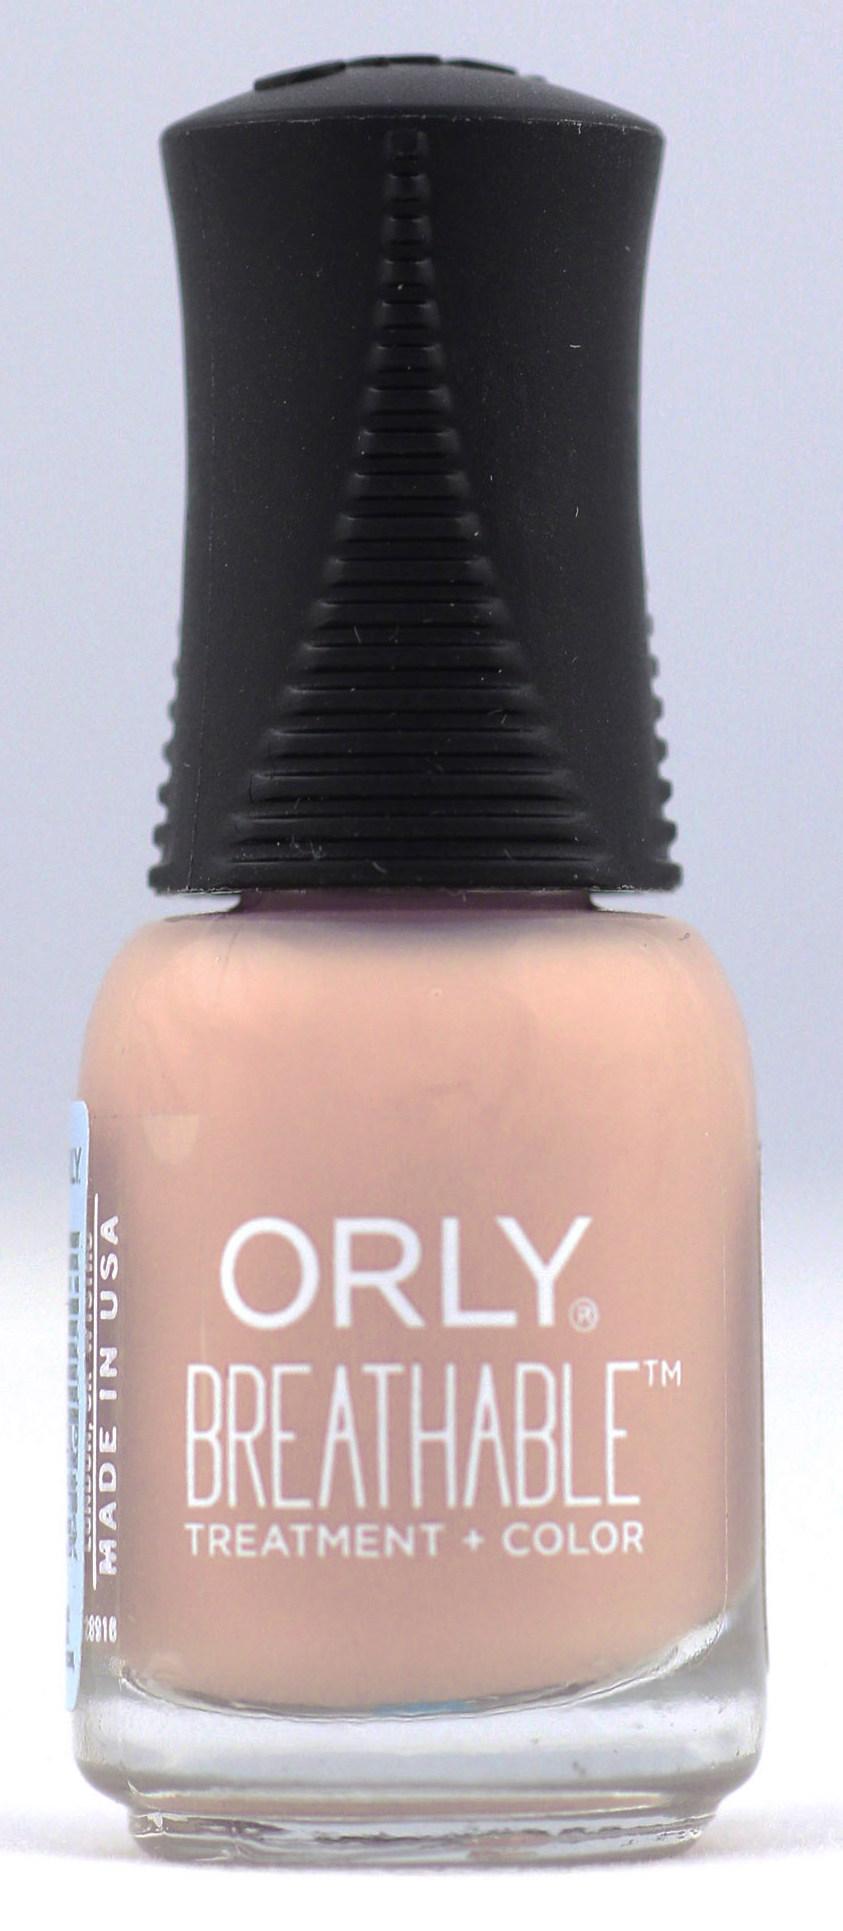 ORLY 907 лак для ногтей / NOURISHING NUDE BREATHABLE 5,3 мл лаки для ногтей orly мини лак для ногтей 678 sheer nude